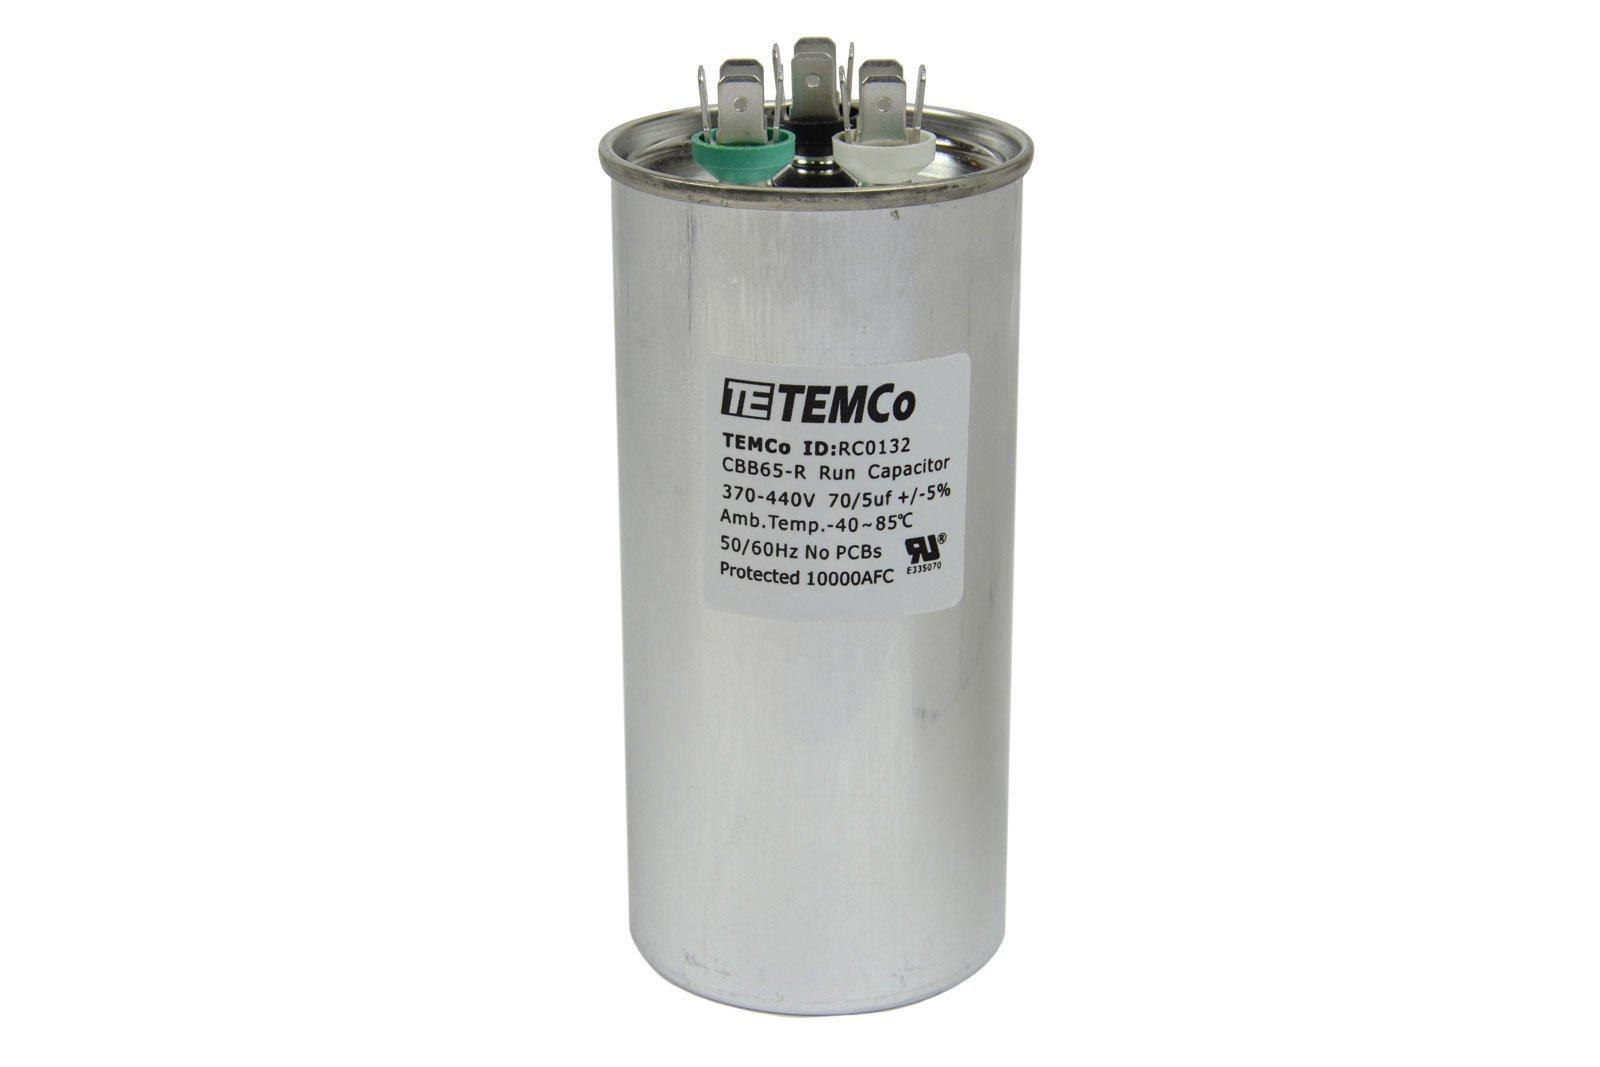 Cheap Electric Motor Capacitor Wiring Diagram Find Marathon Motors Diagrams Get Quotations Temco Dual Run Rc0132 70 5 Mfd 370 V 440 Vac Volt